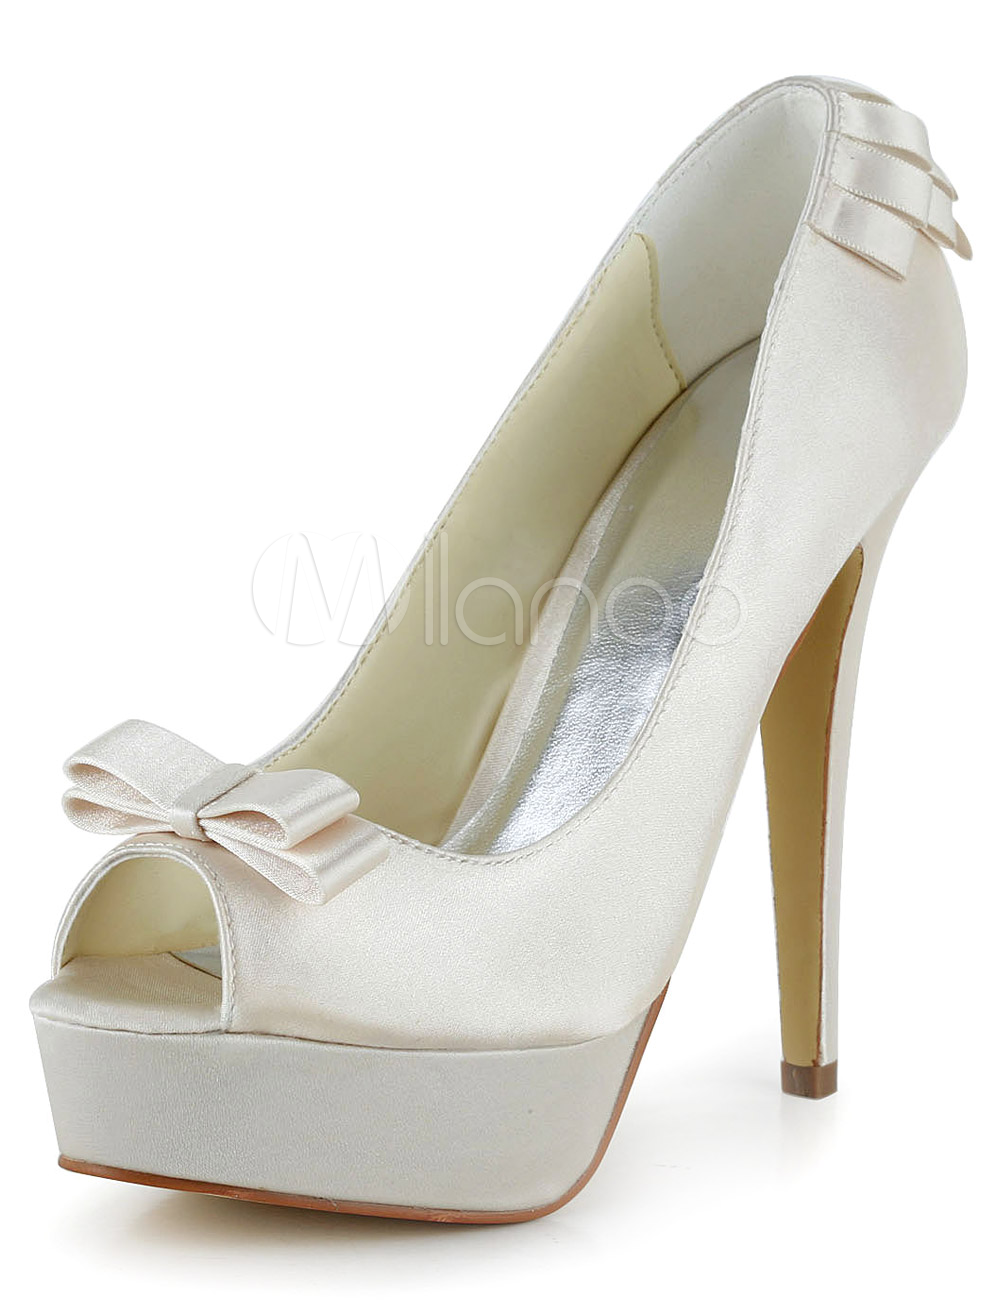 White Bow Peep Toe Evening and Bridal Platforms